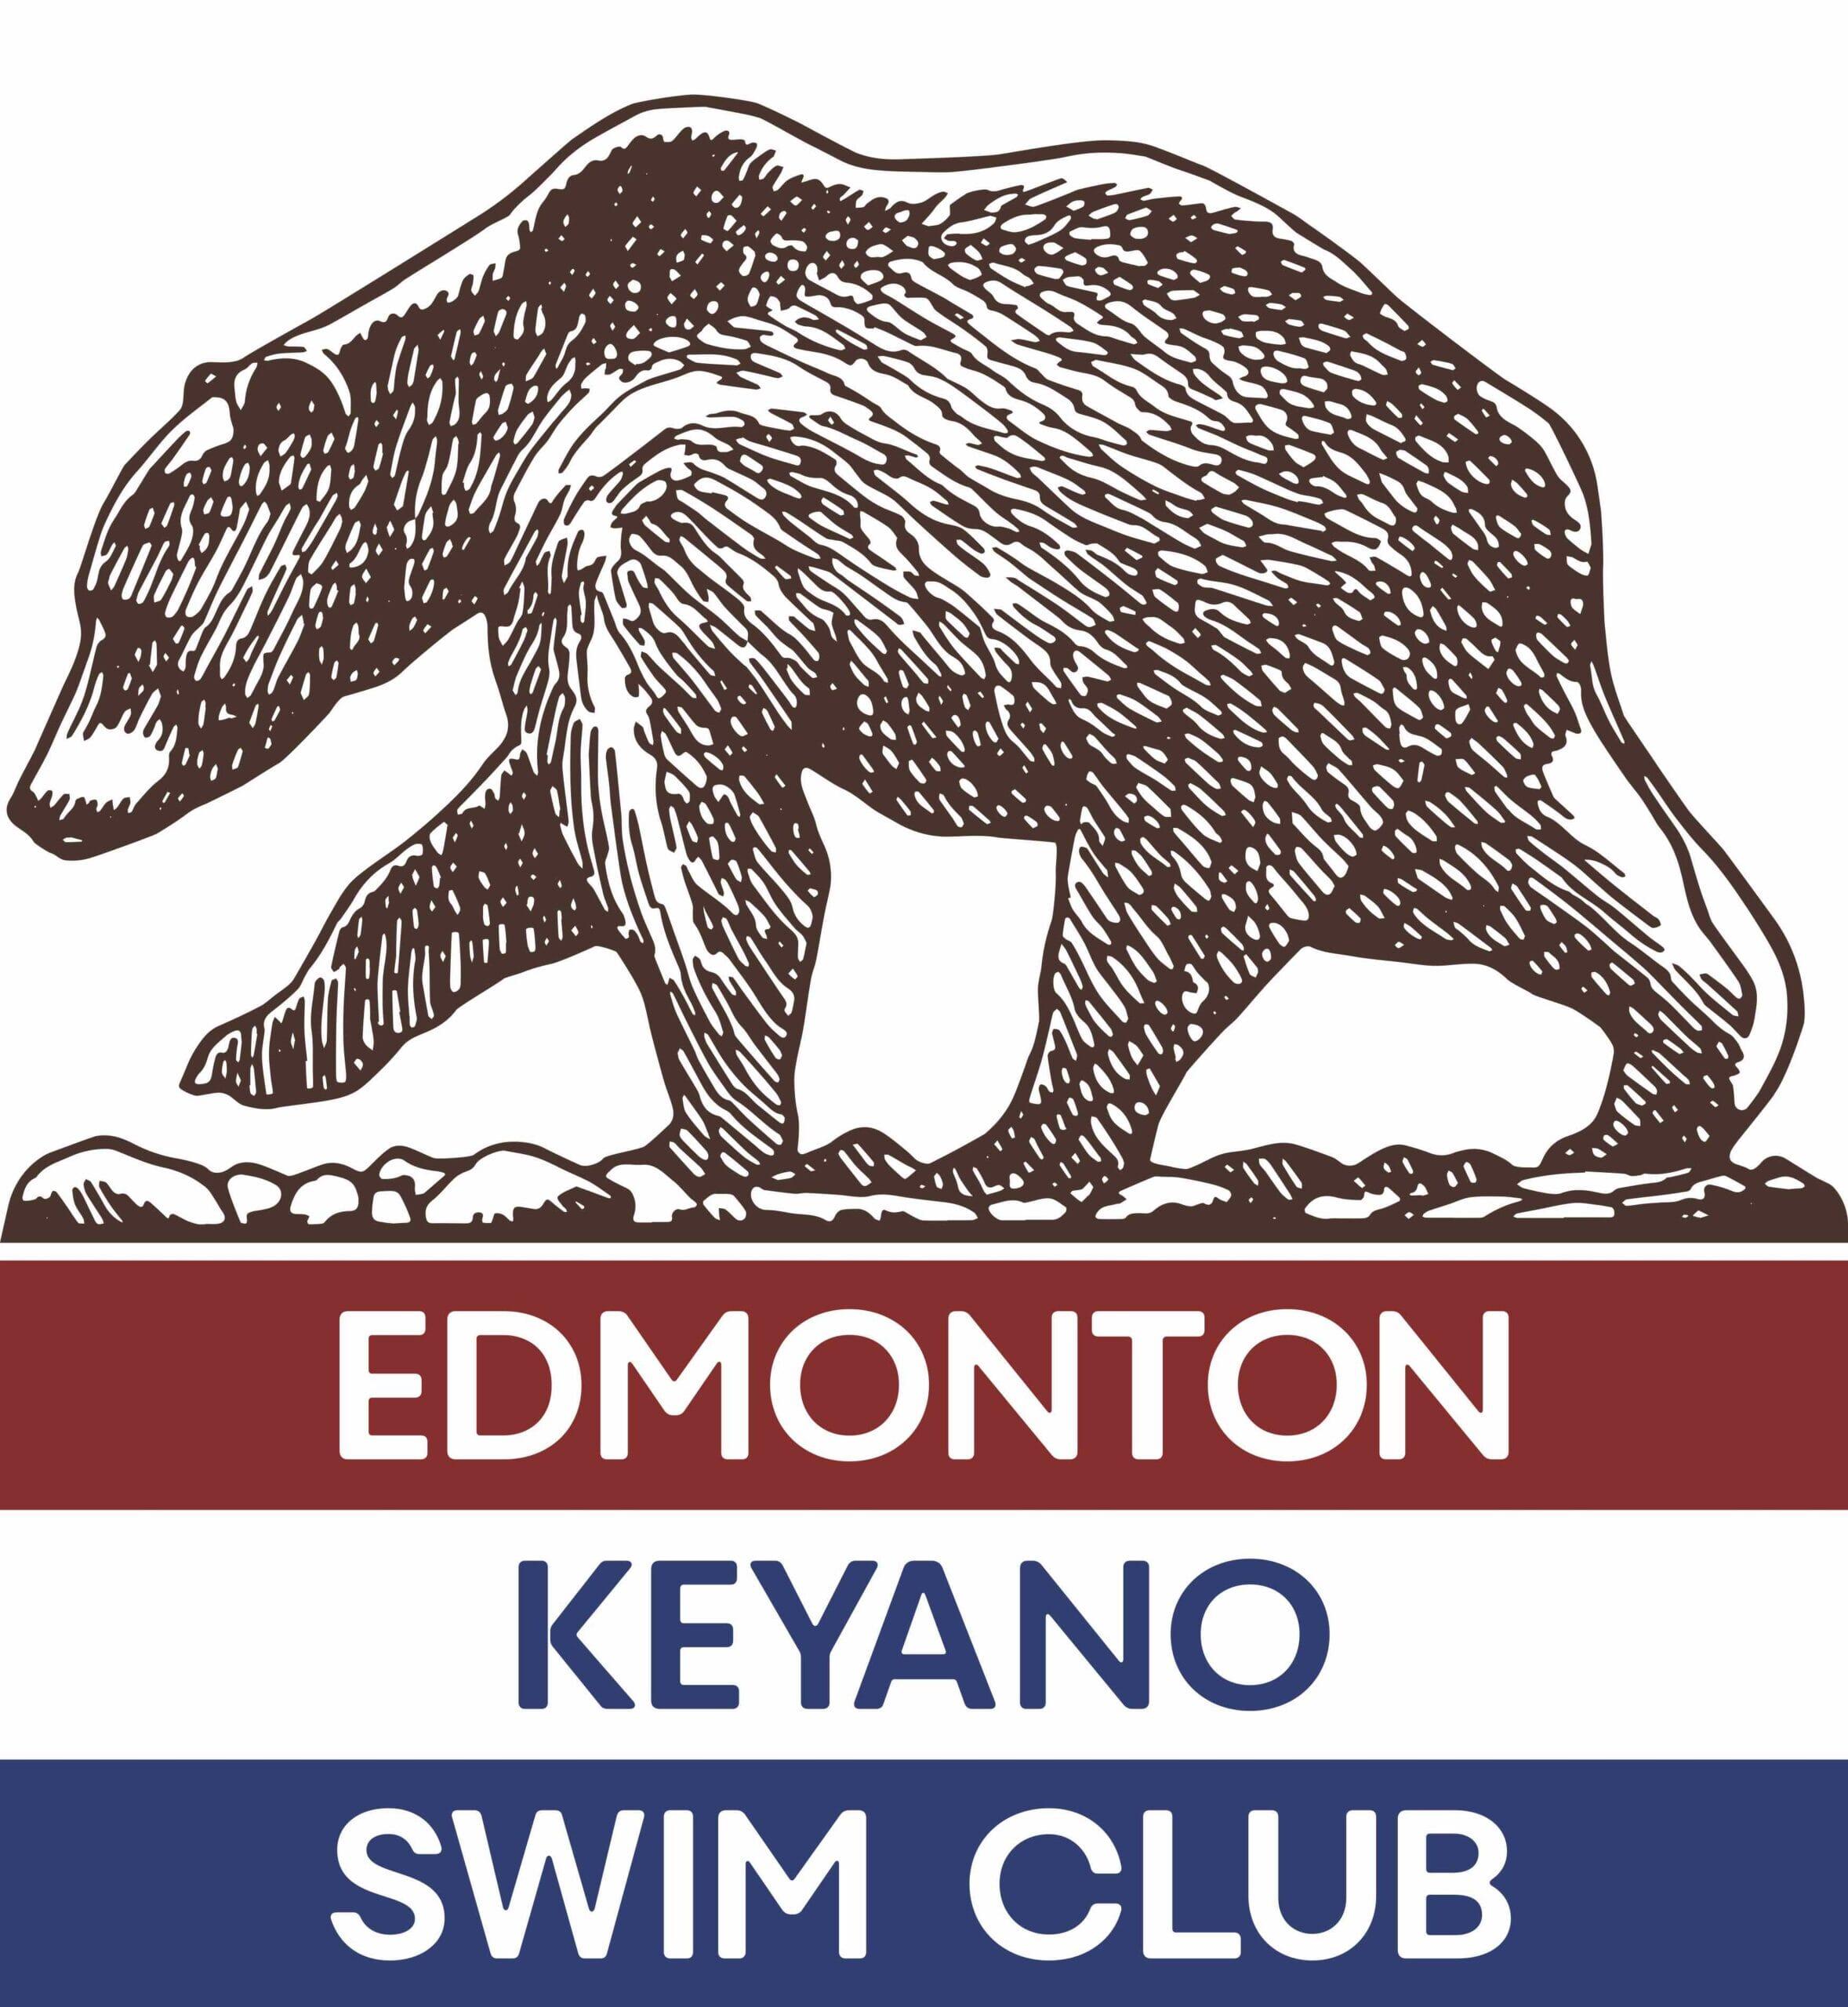 Edmonton Keyano Swim Club logo